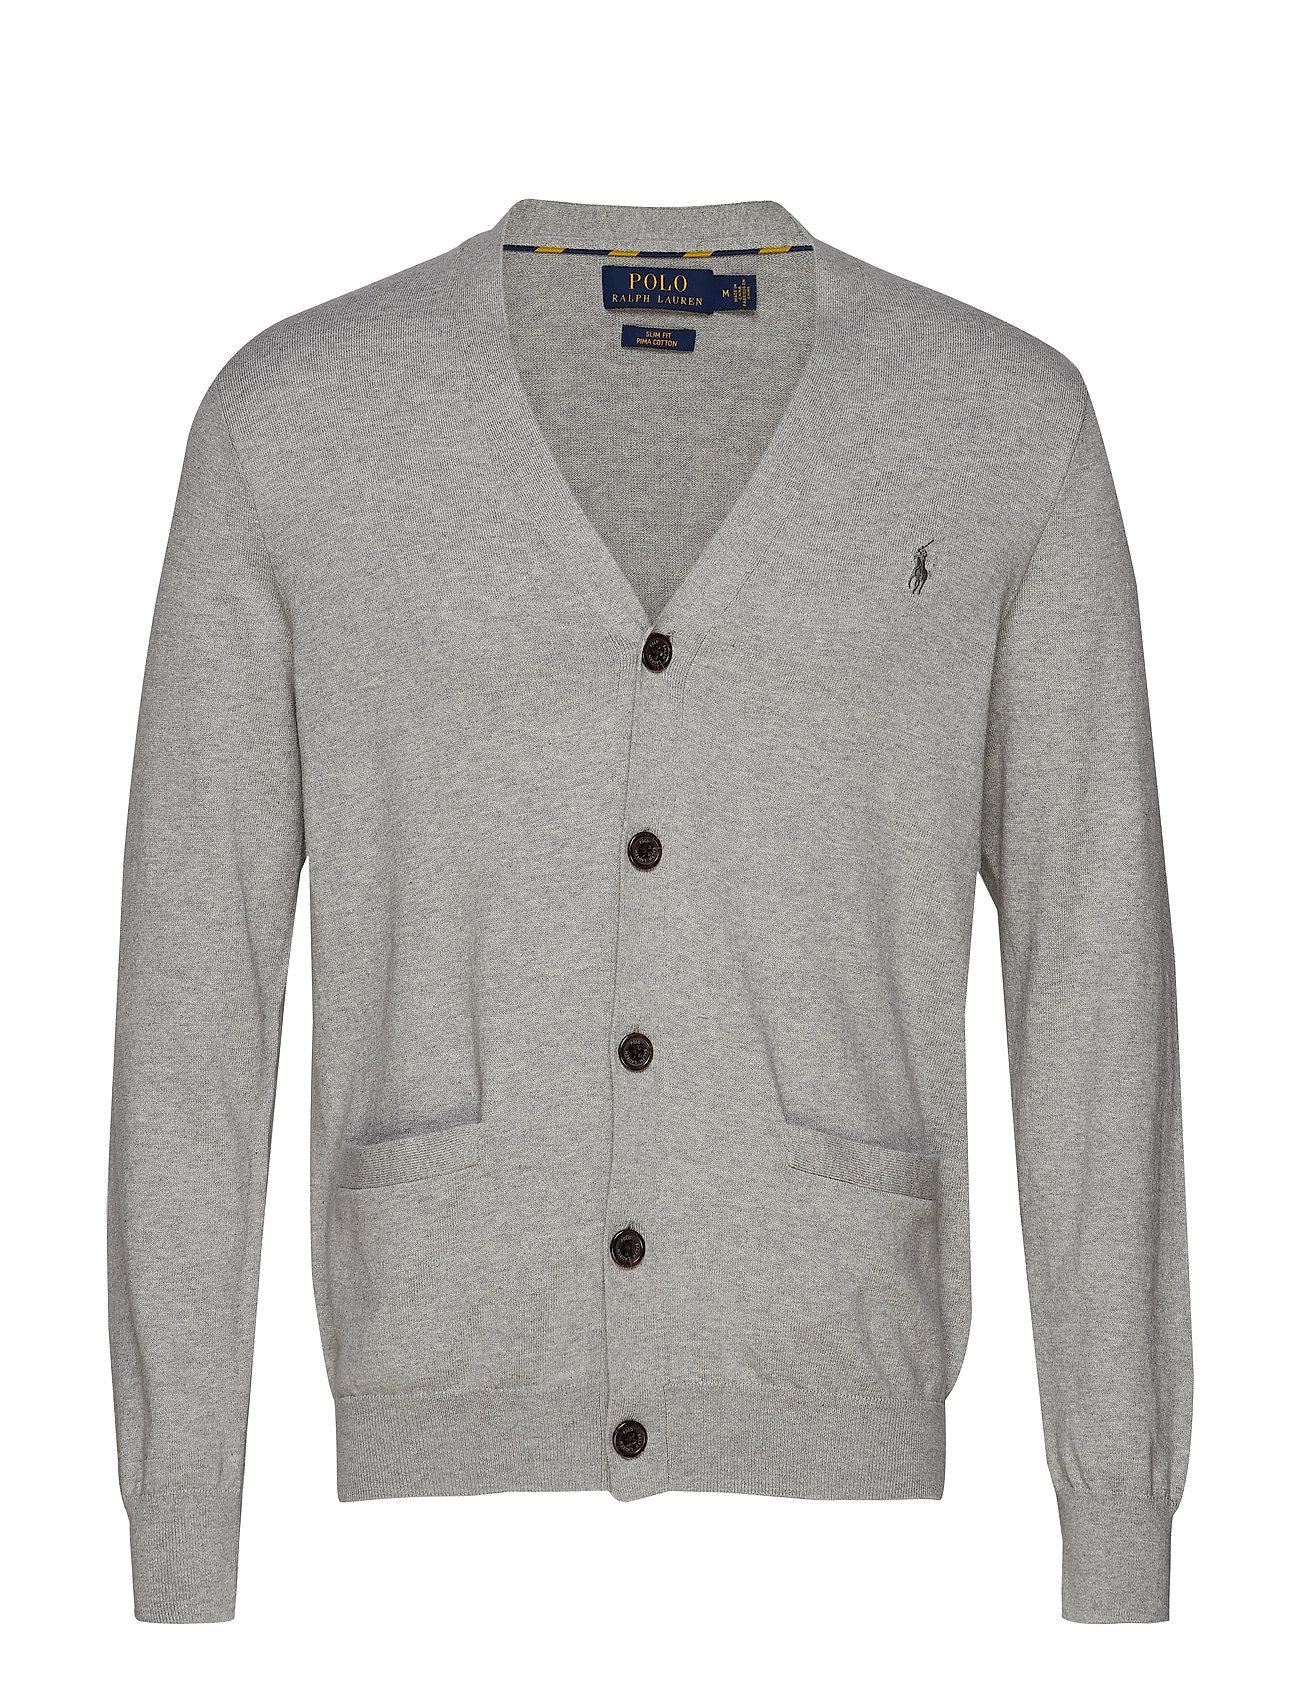 Polo Ralph Lauren Slim Fit Cotton Cardigan - ANDOVER HEATHER